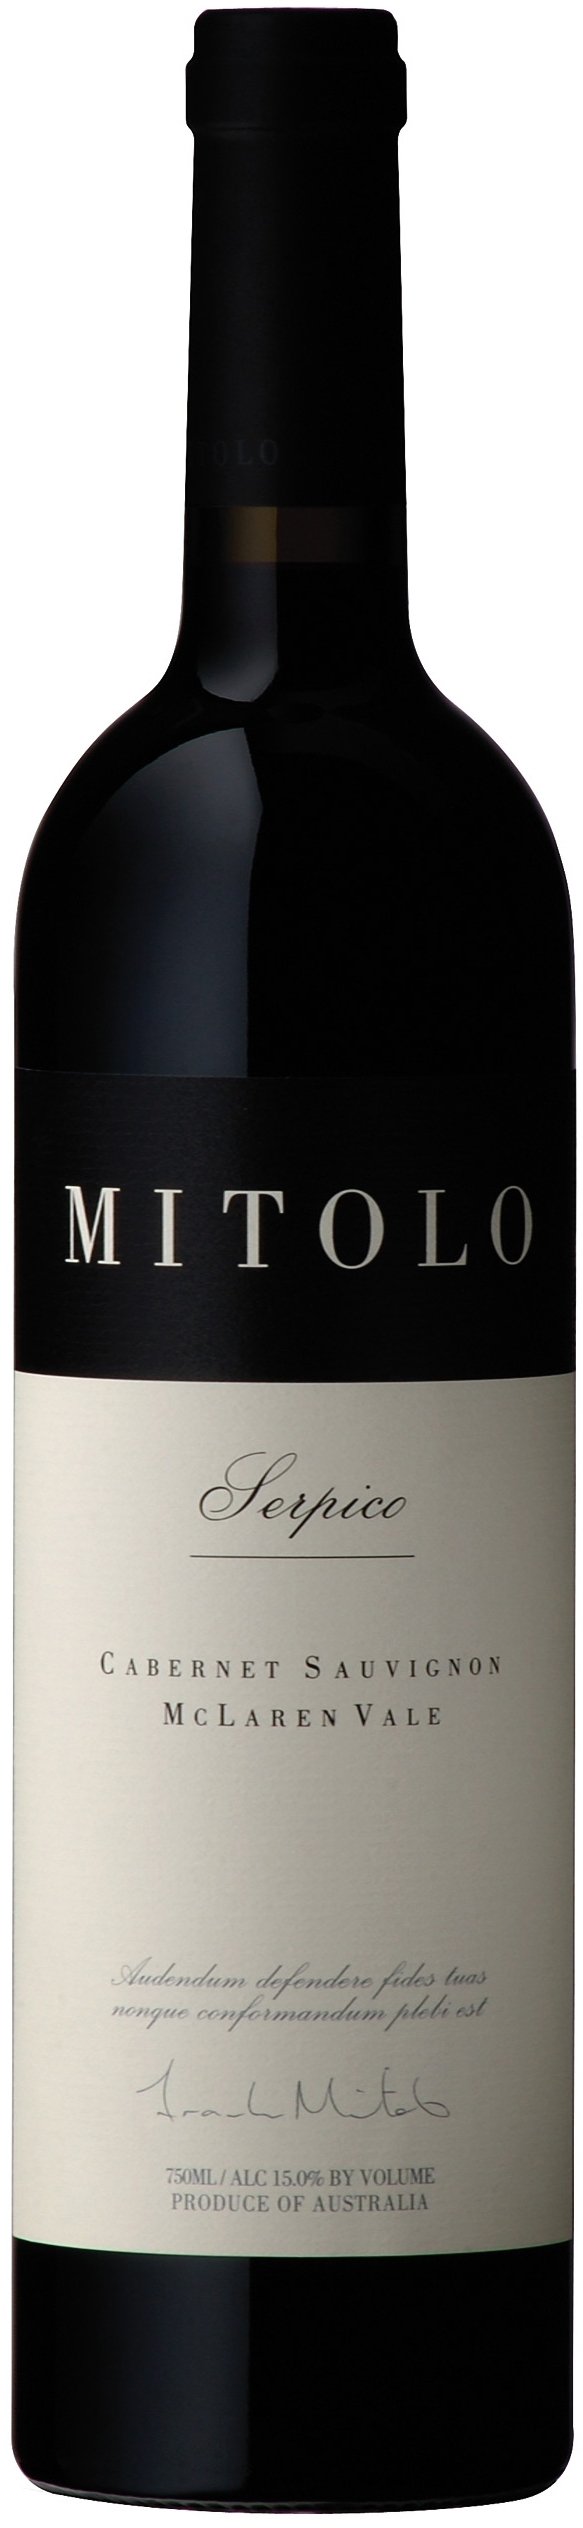 Mitolo, `Serpico` McLaren Vale Cabernet Sauvignon 2013